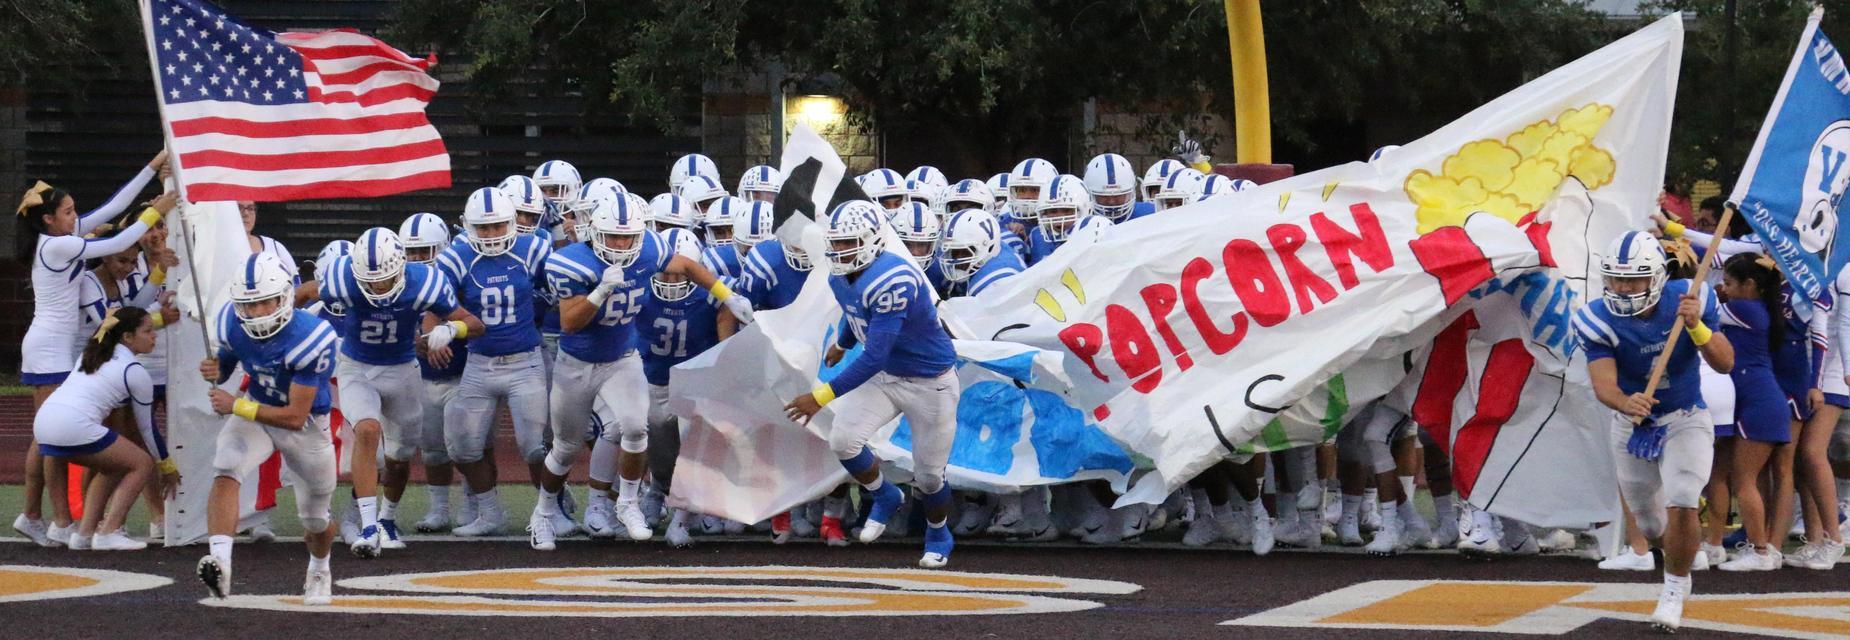 Veterans Memorial High School Patriot Football and Cheer team.